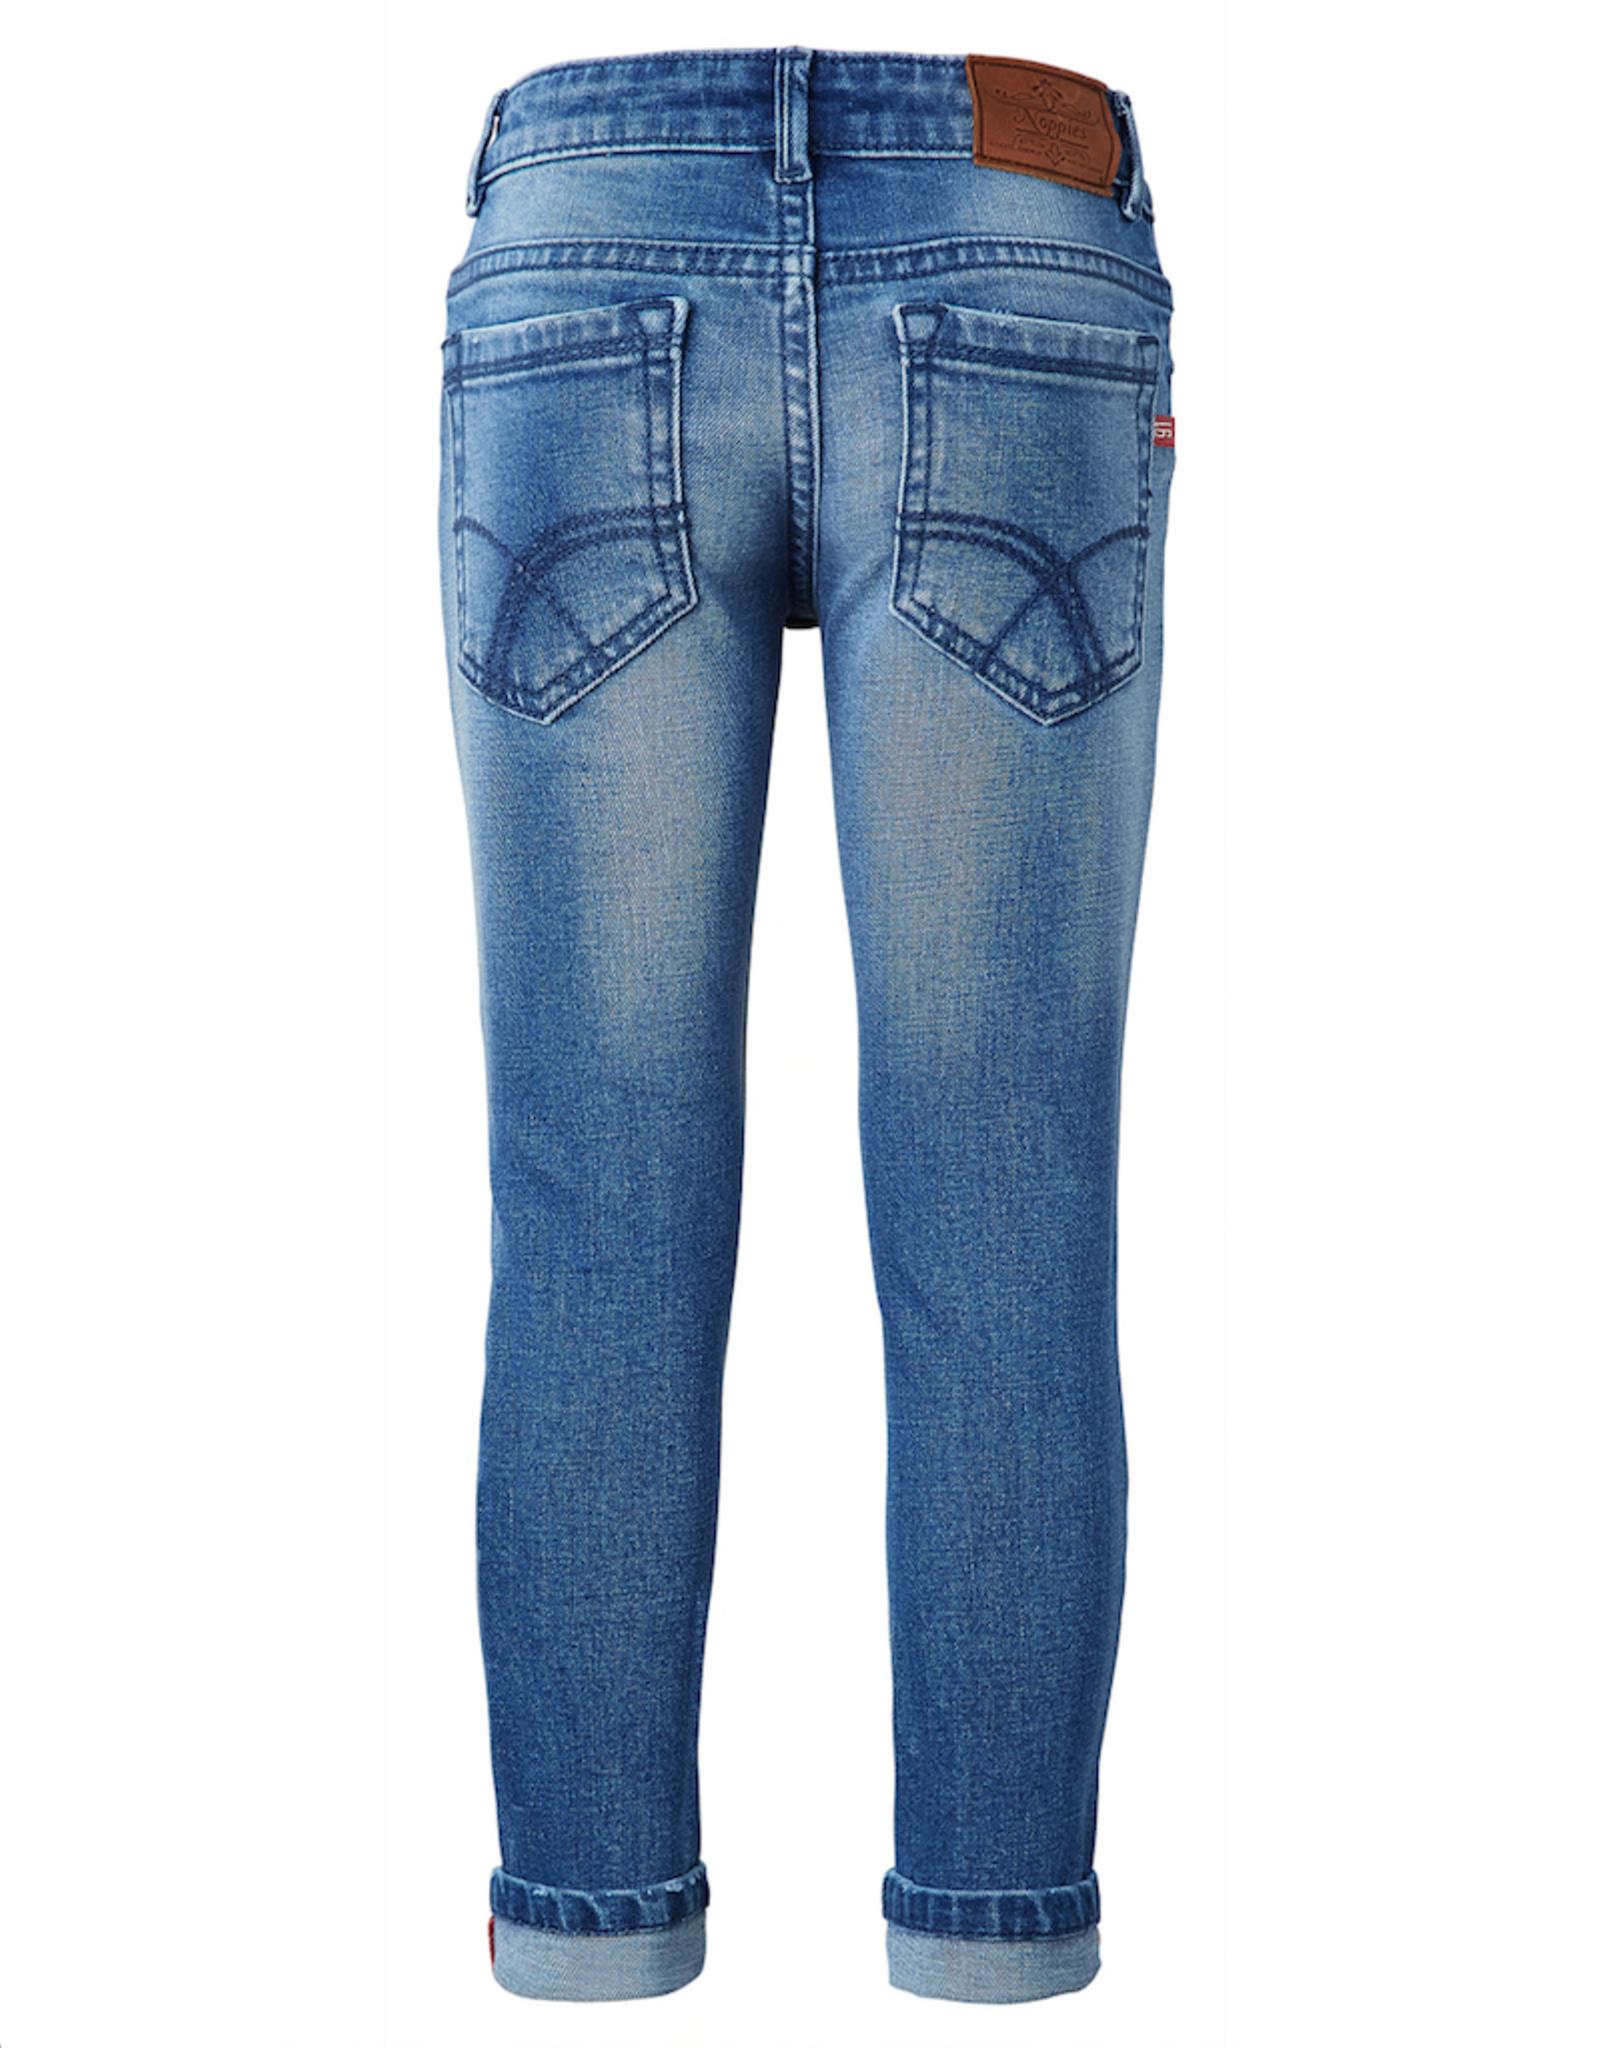 Noppies Kids Arniston Stone Washed Jeans